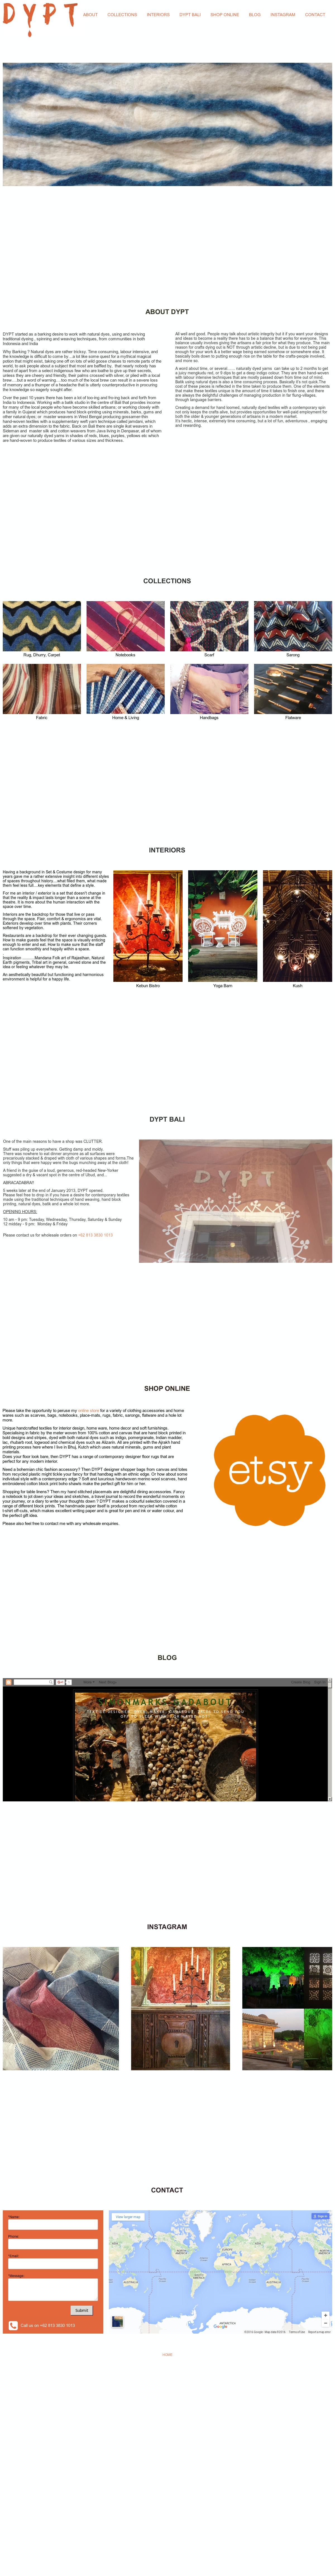 Simon Marks Textile Designer & Natural Dyer Competitors, Revenue and